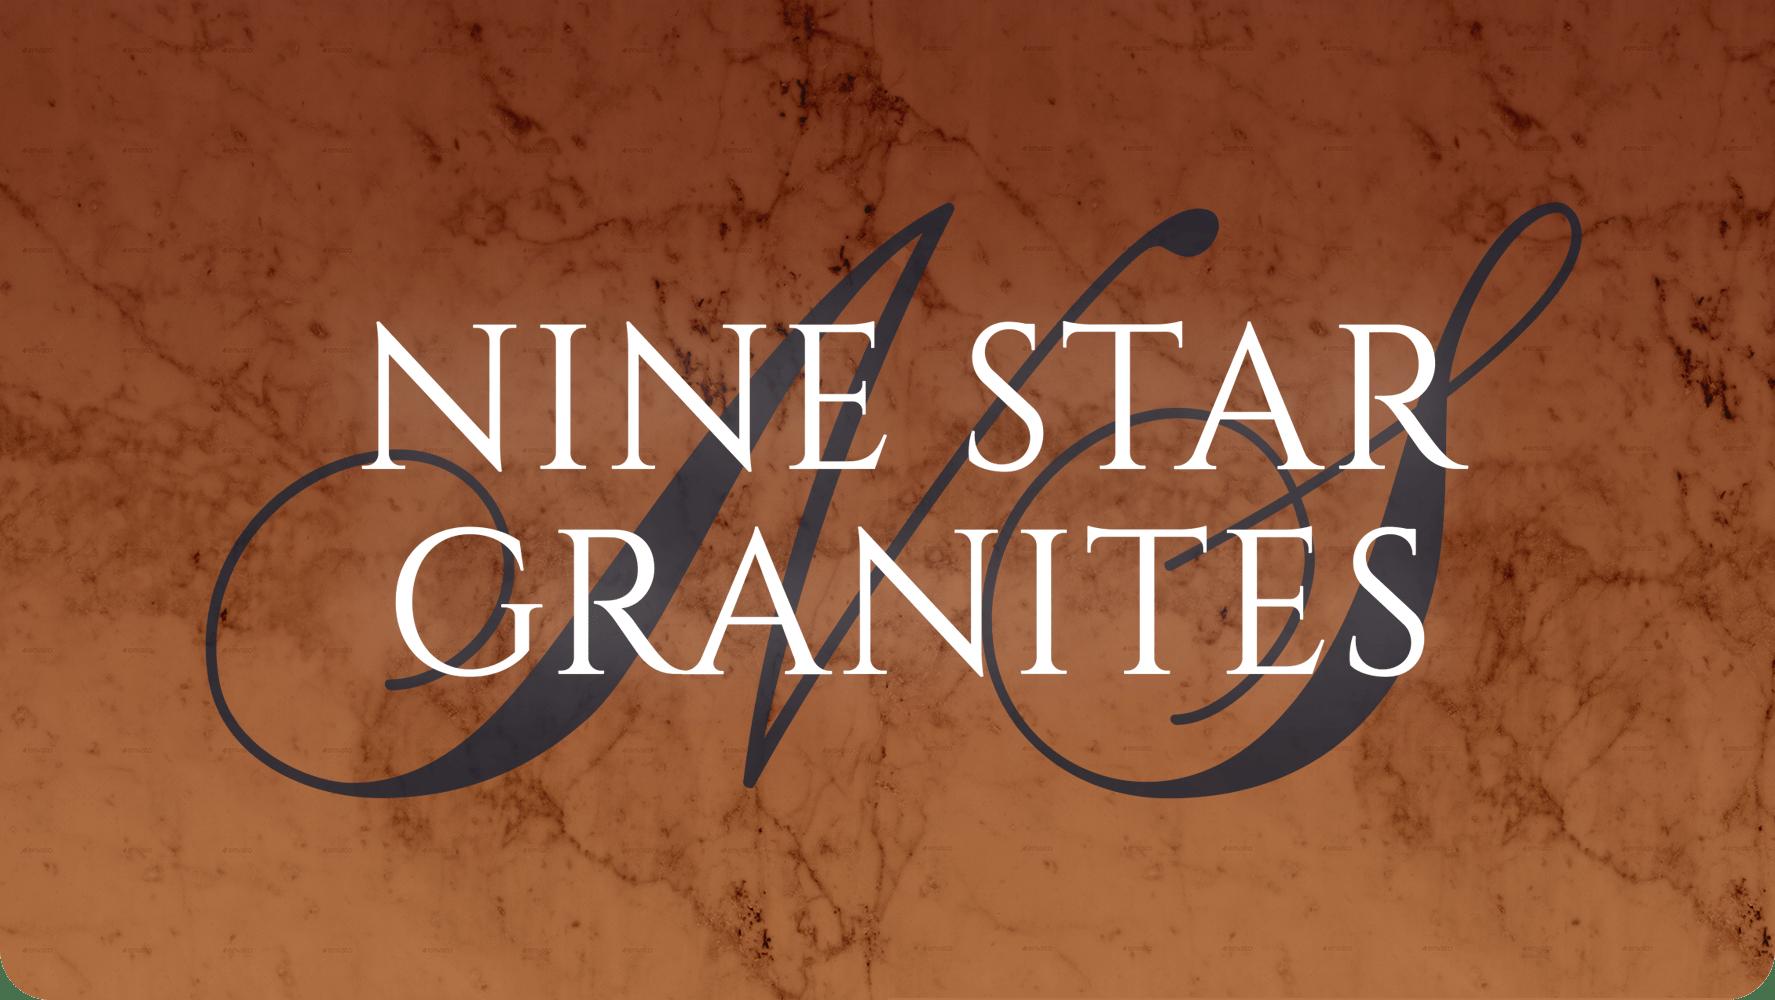 Nine Star Granites